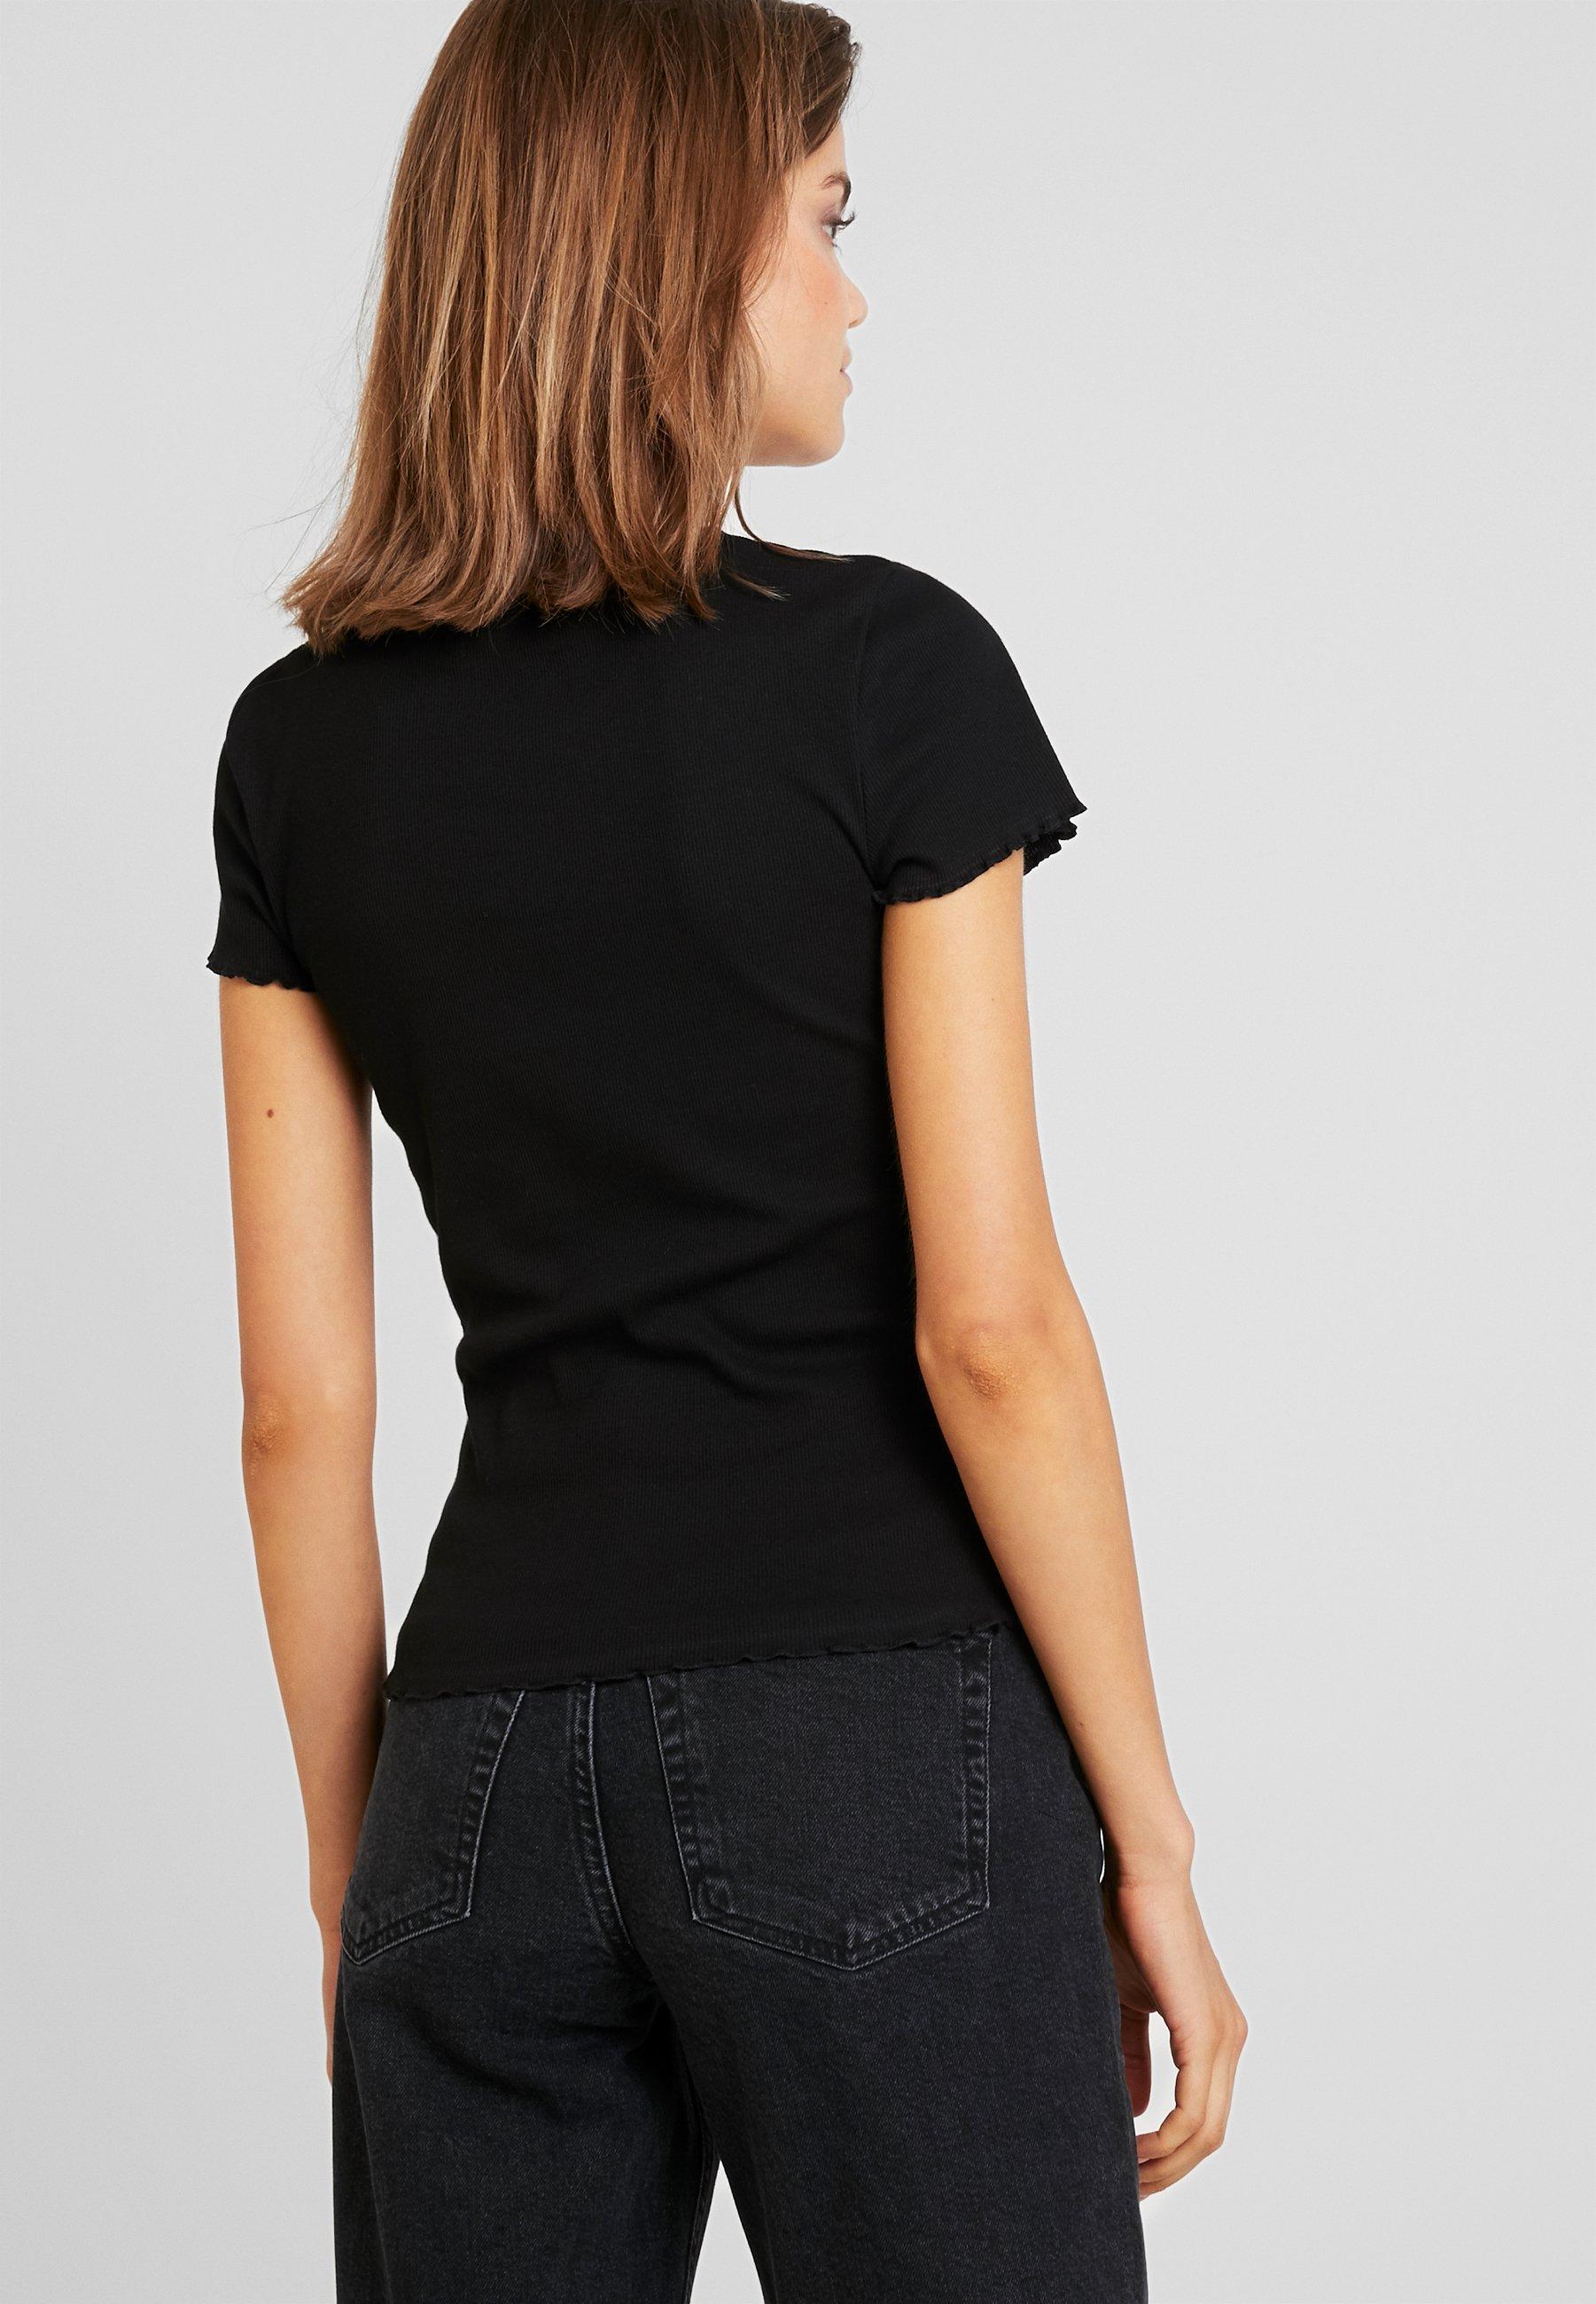 Lettuce Warehouse TeeT Edge shirt Basique Black Pk8nw0OX